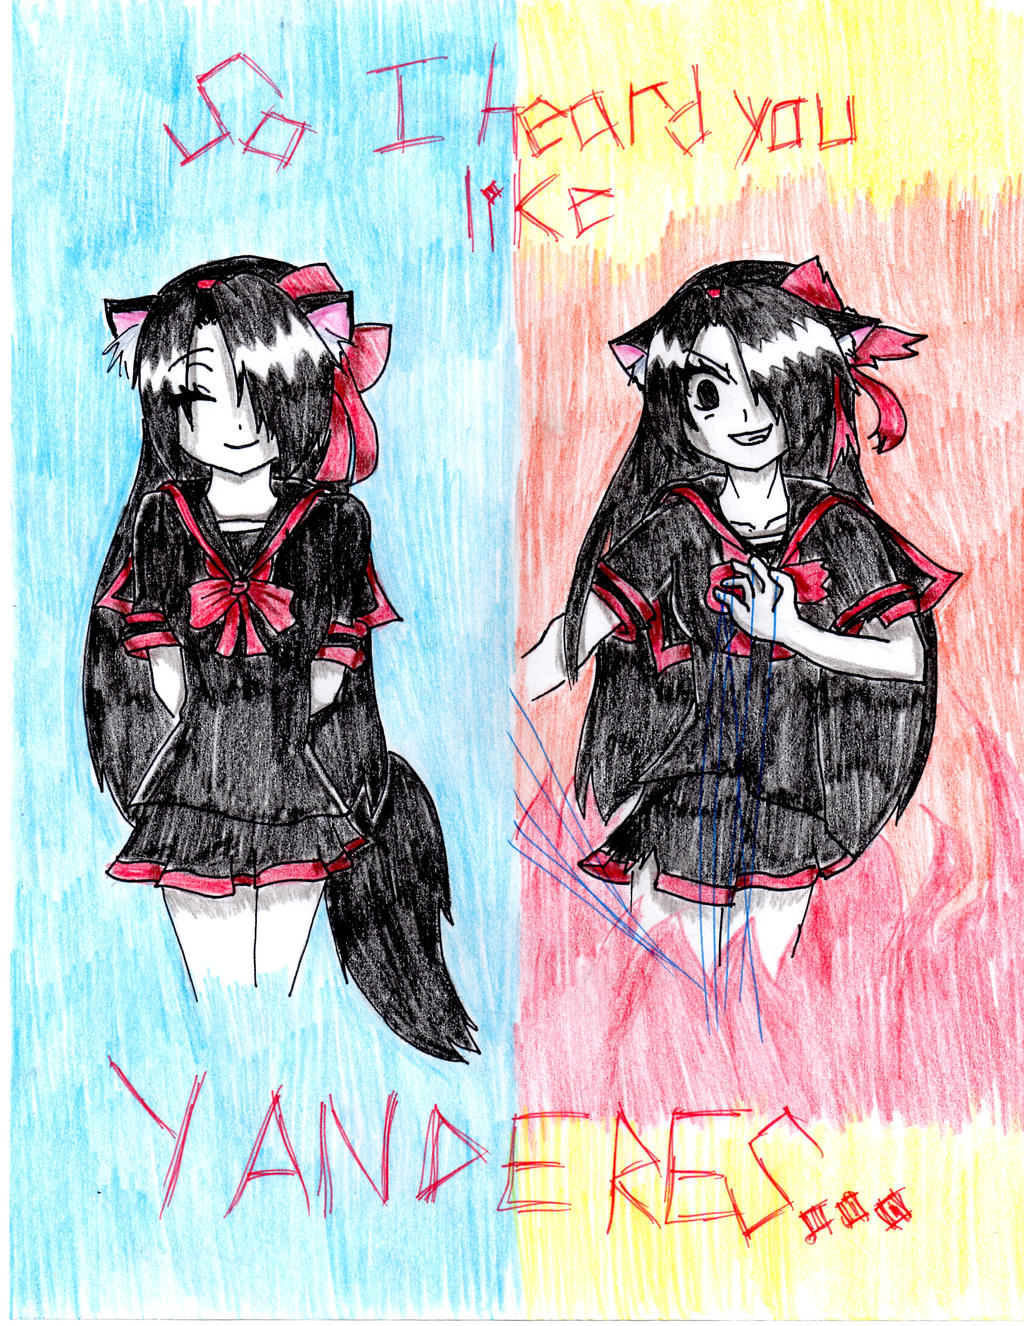 So I Heard You Like Yanderes... by MitsukiChan313